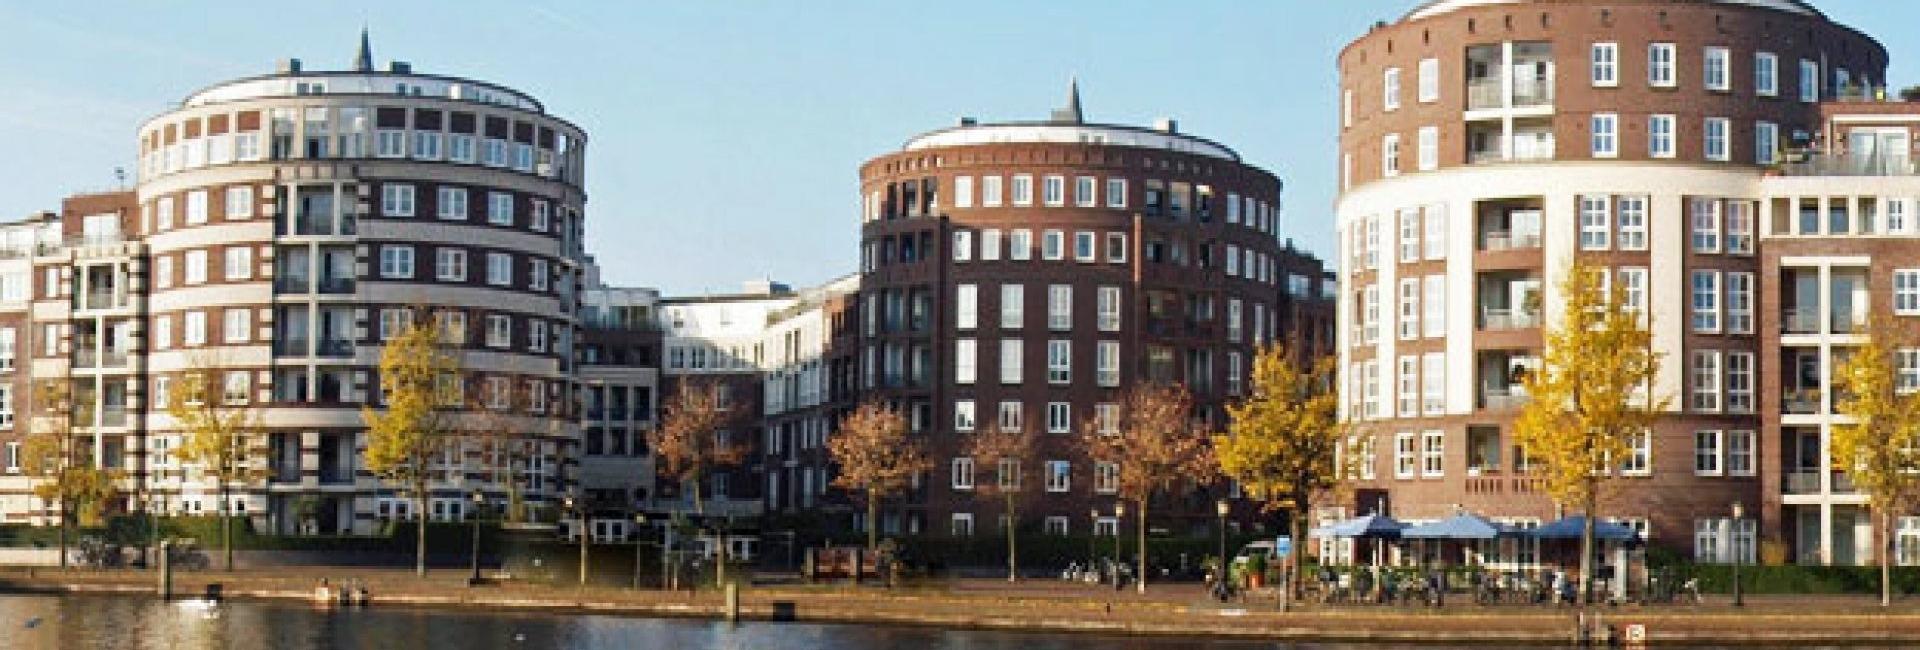 Hypnosehuis Amsterdam